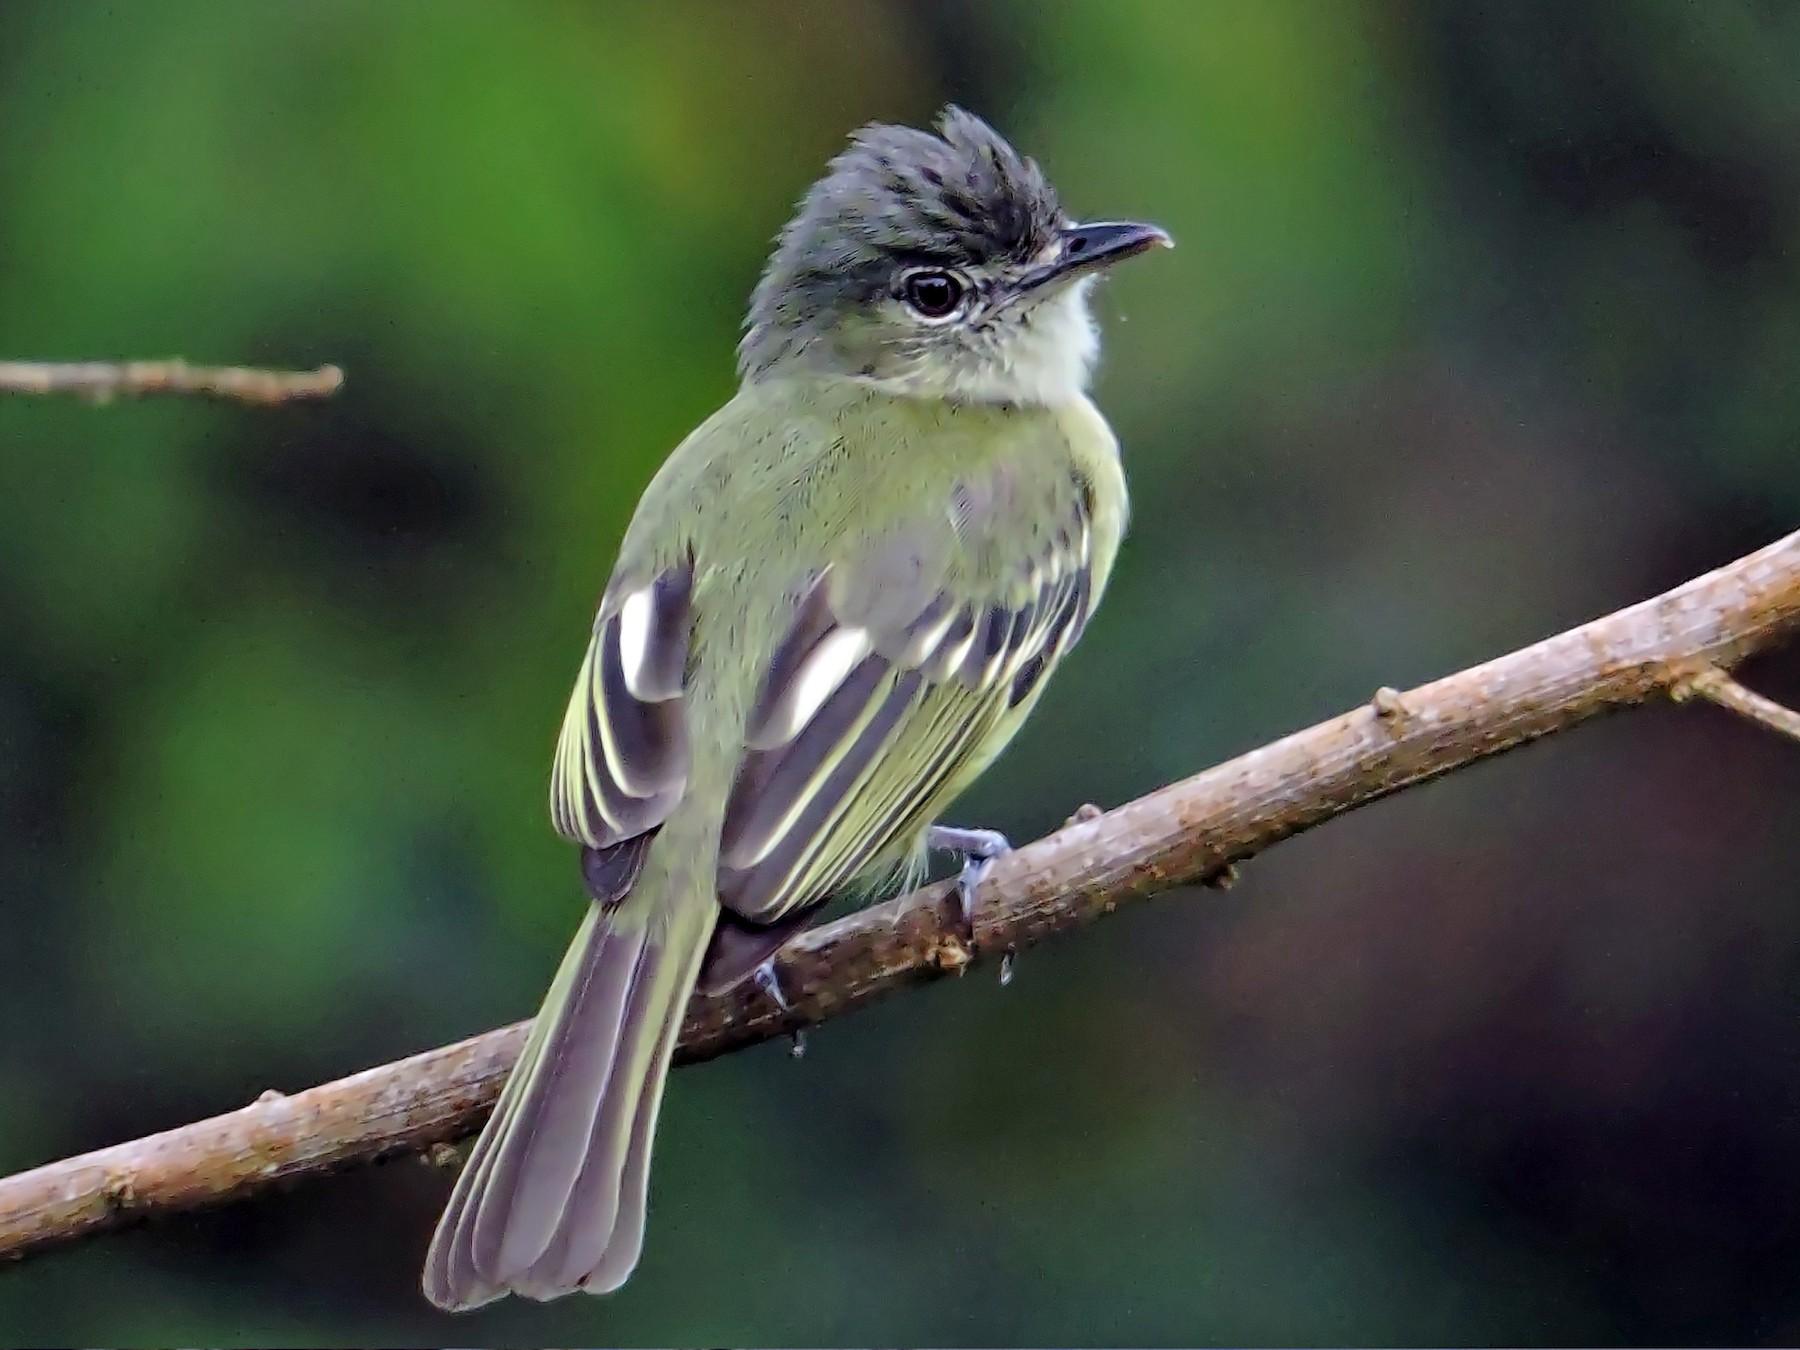 Yellow-margined Flycatcher - Jorge Muñoz García   CAQUETA BIRDING